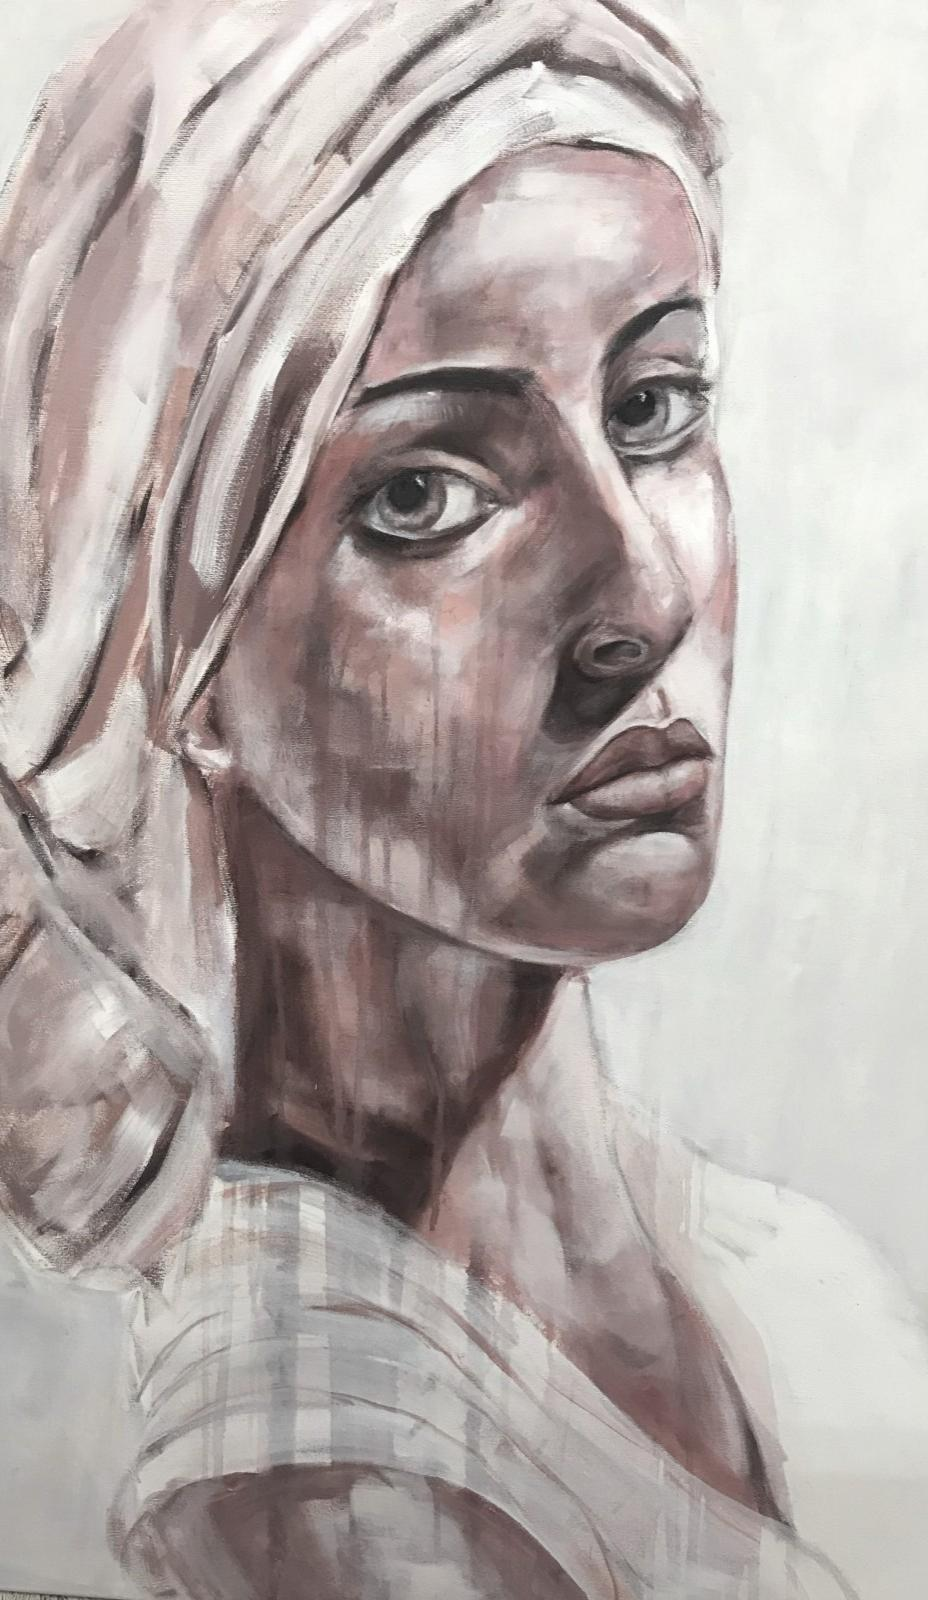 Porträt 'Rhea', Öl auf Leinwand, 120 cm h x 80 cm b x 3 cm t